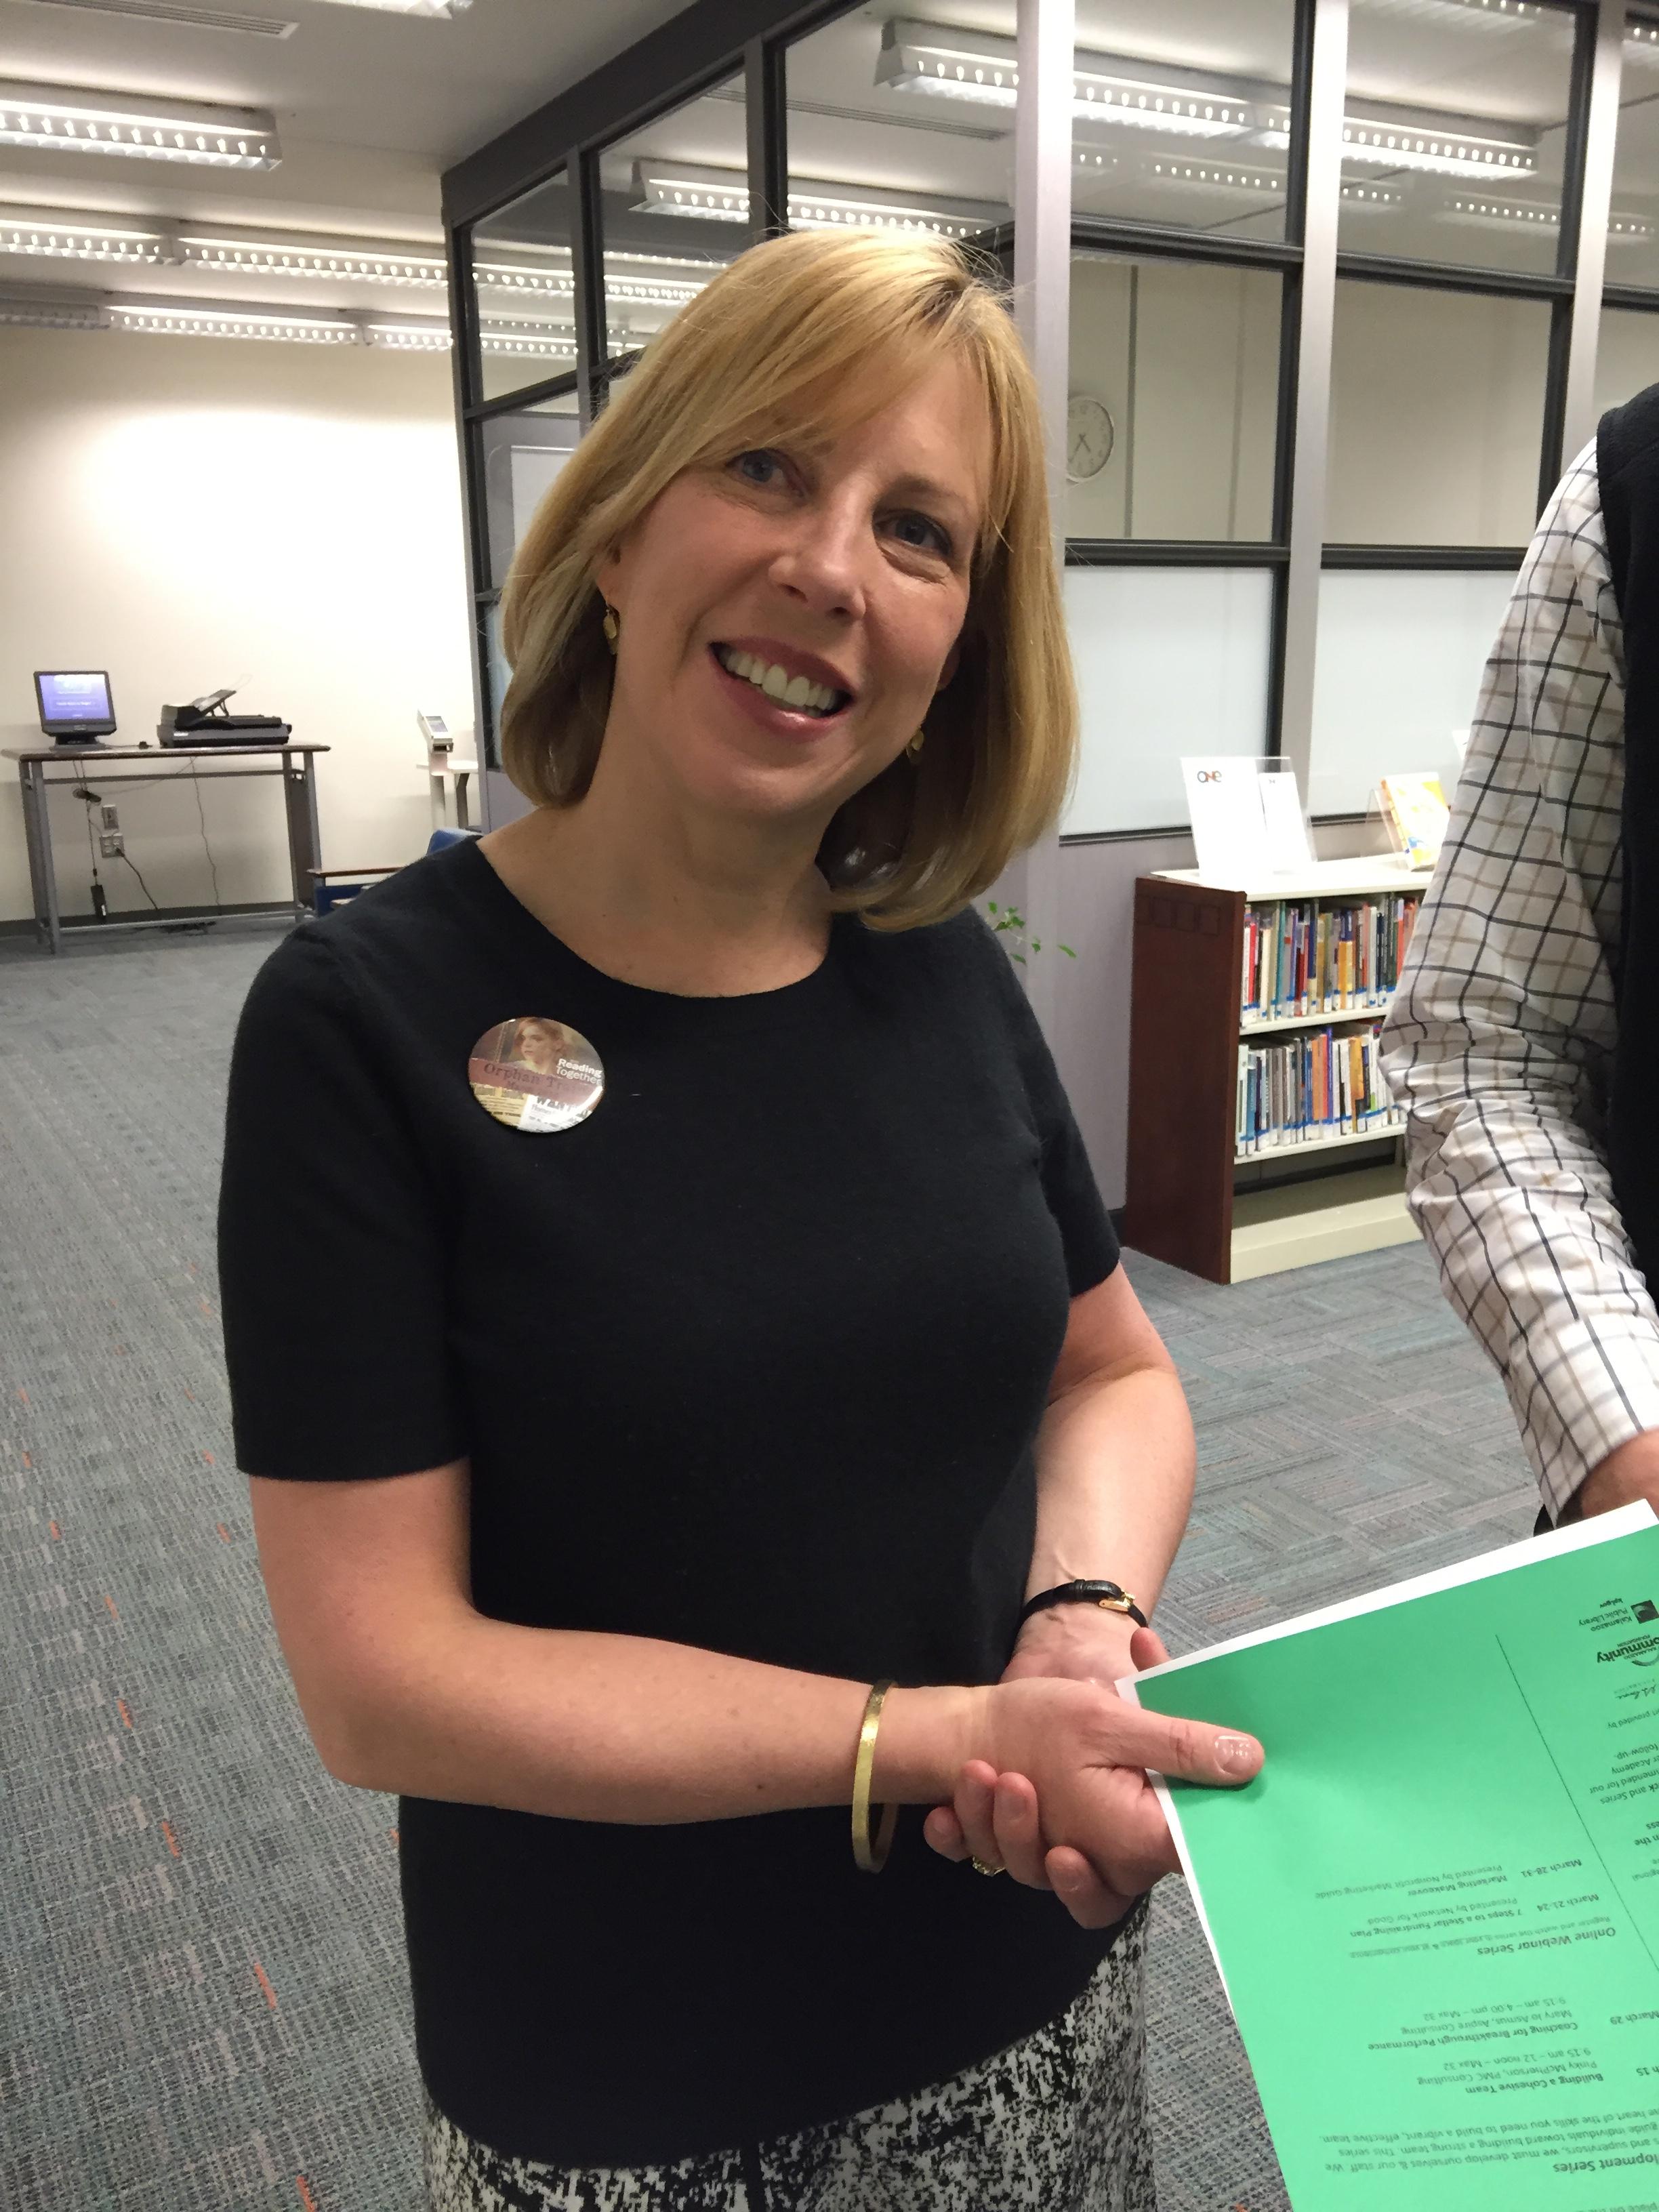 Baker Kline at the Kalamazoo Public Library in 2016.